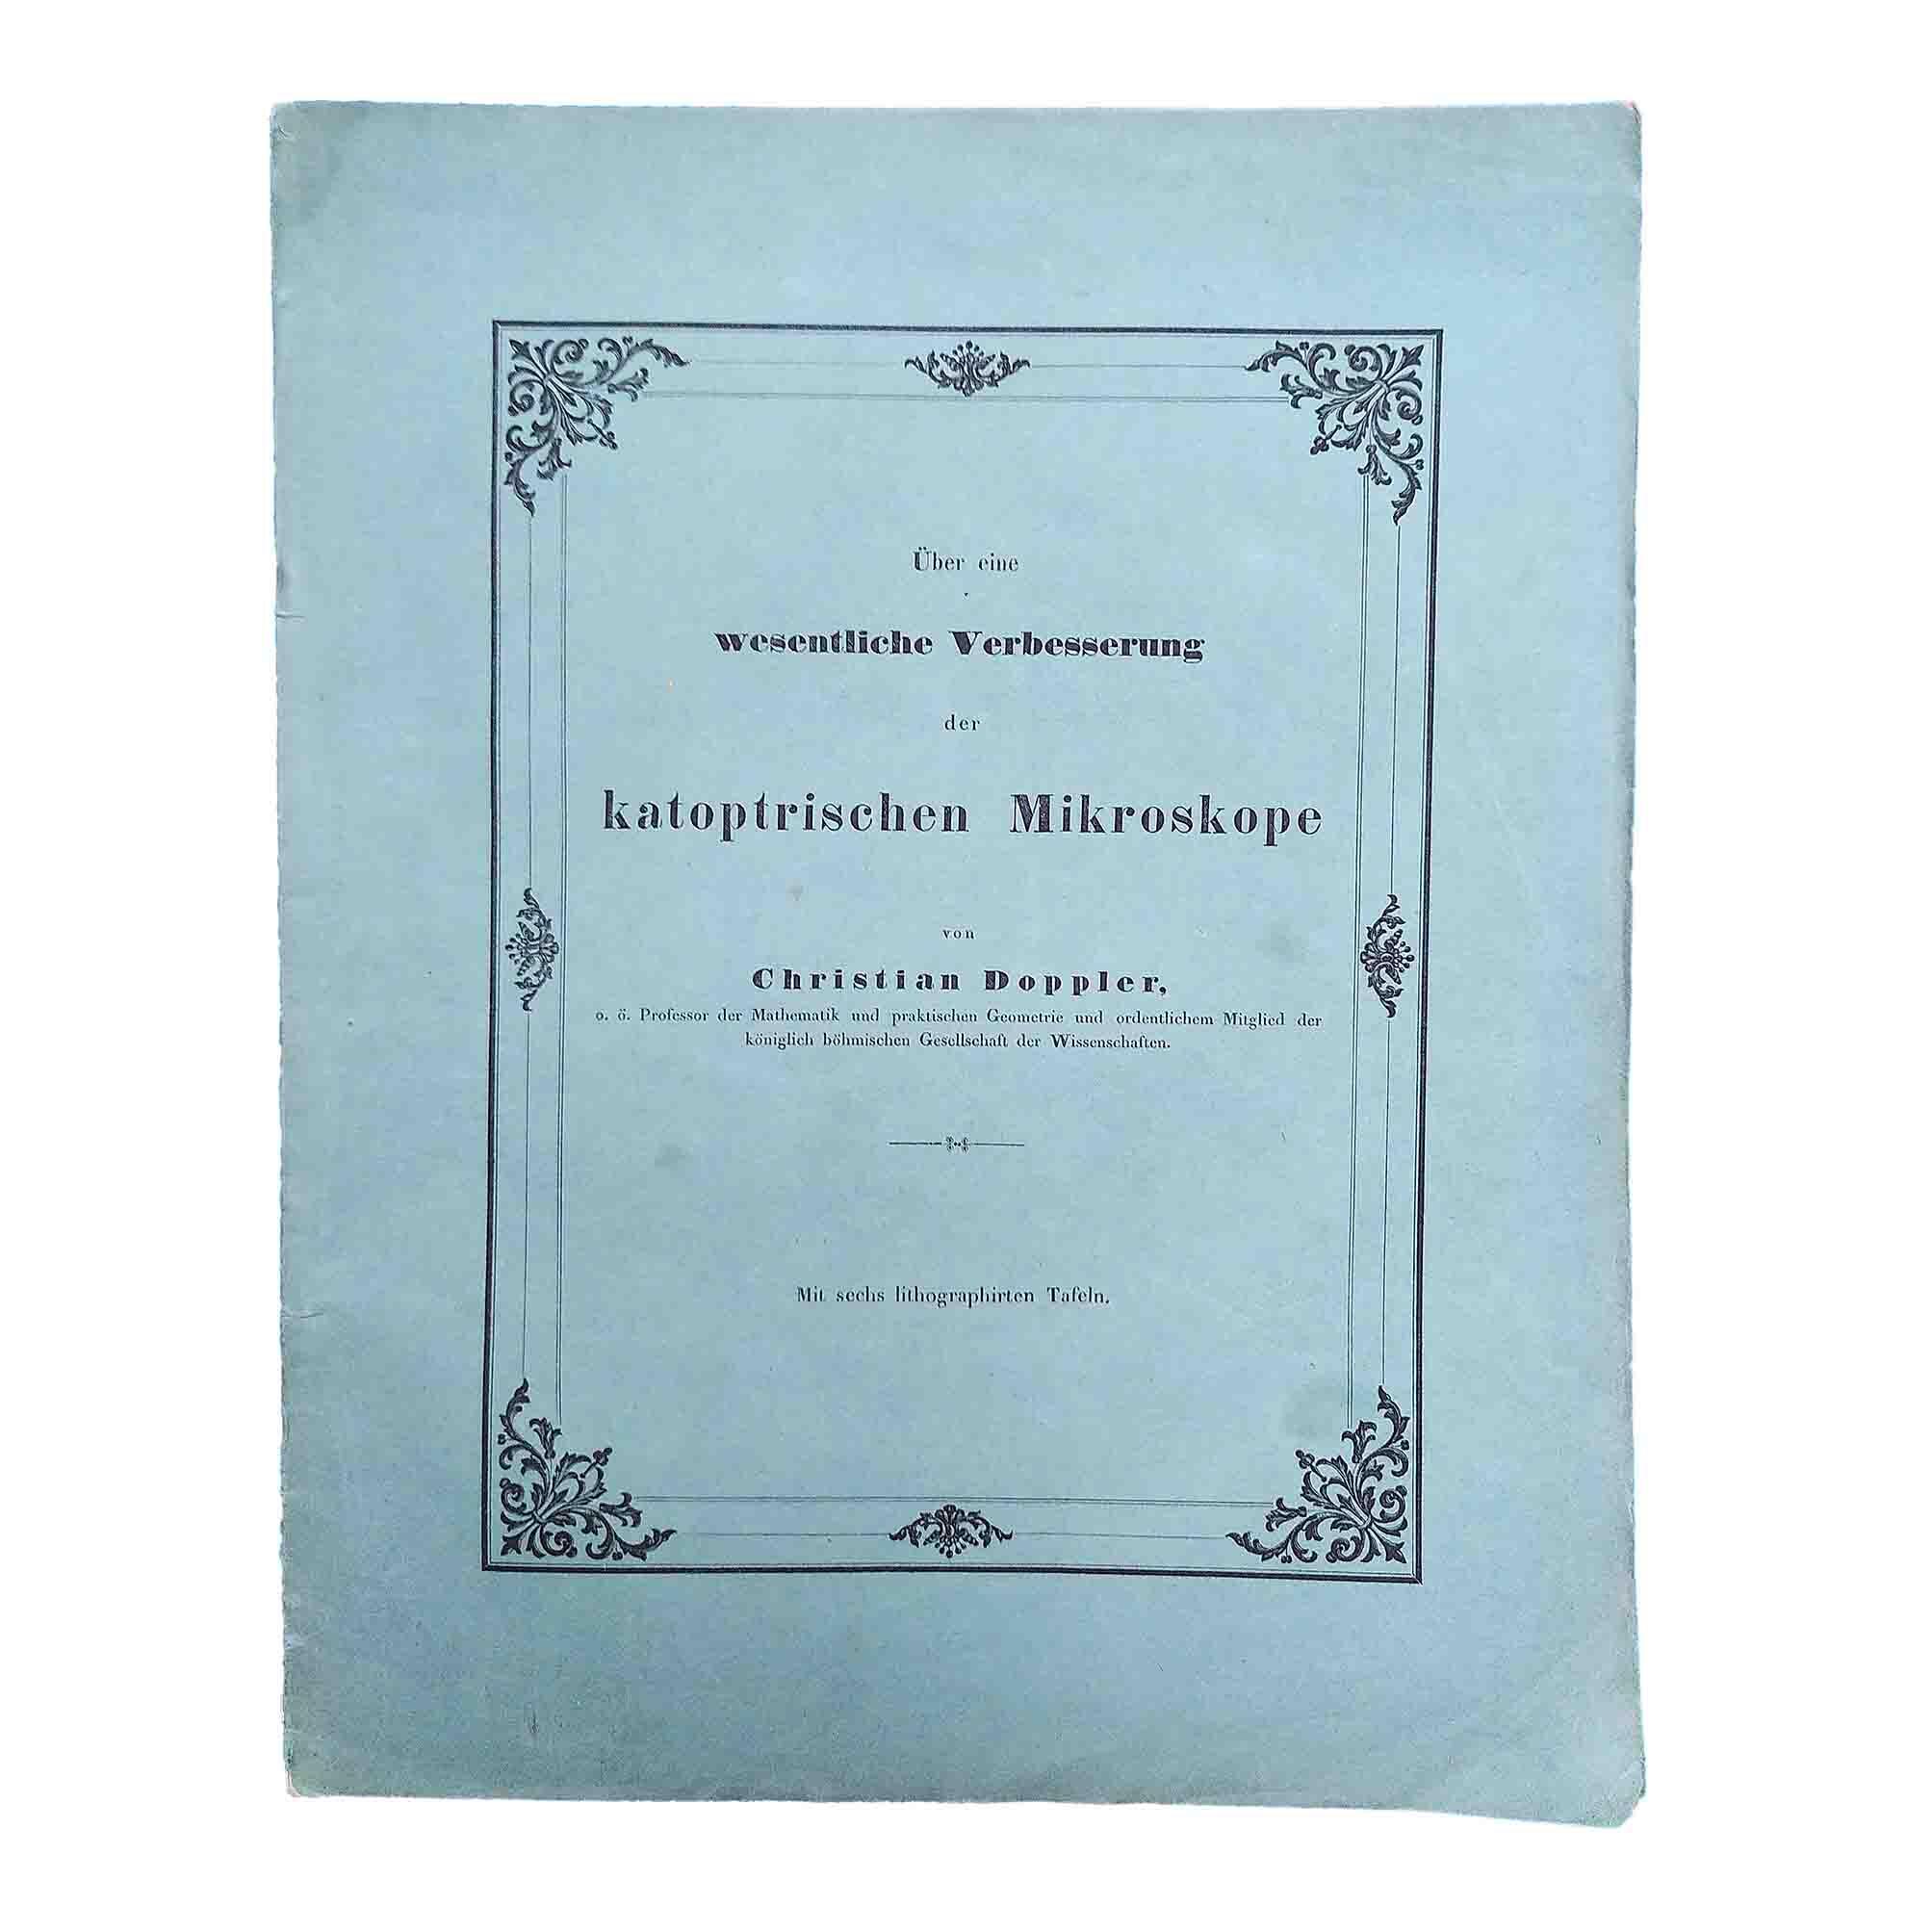 Doppler Katoptrischen Mikroskope 1845 recto free N